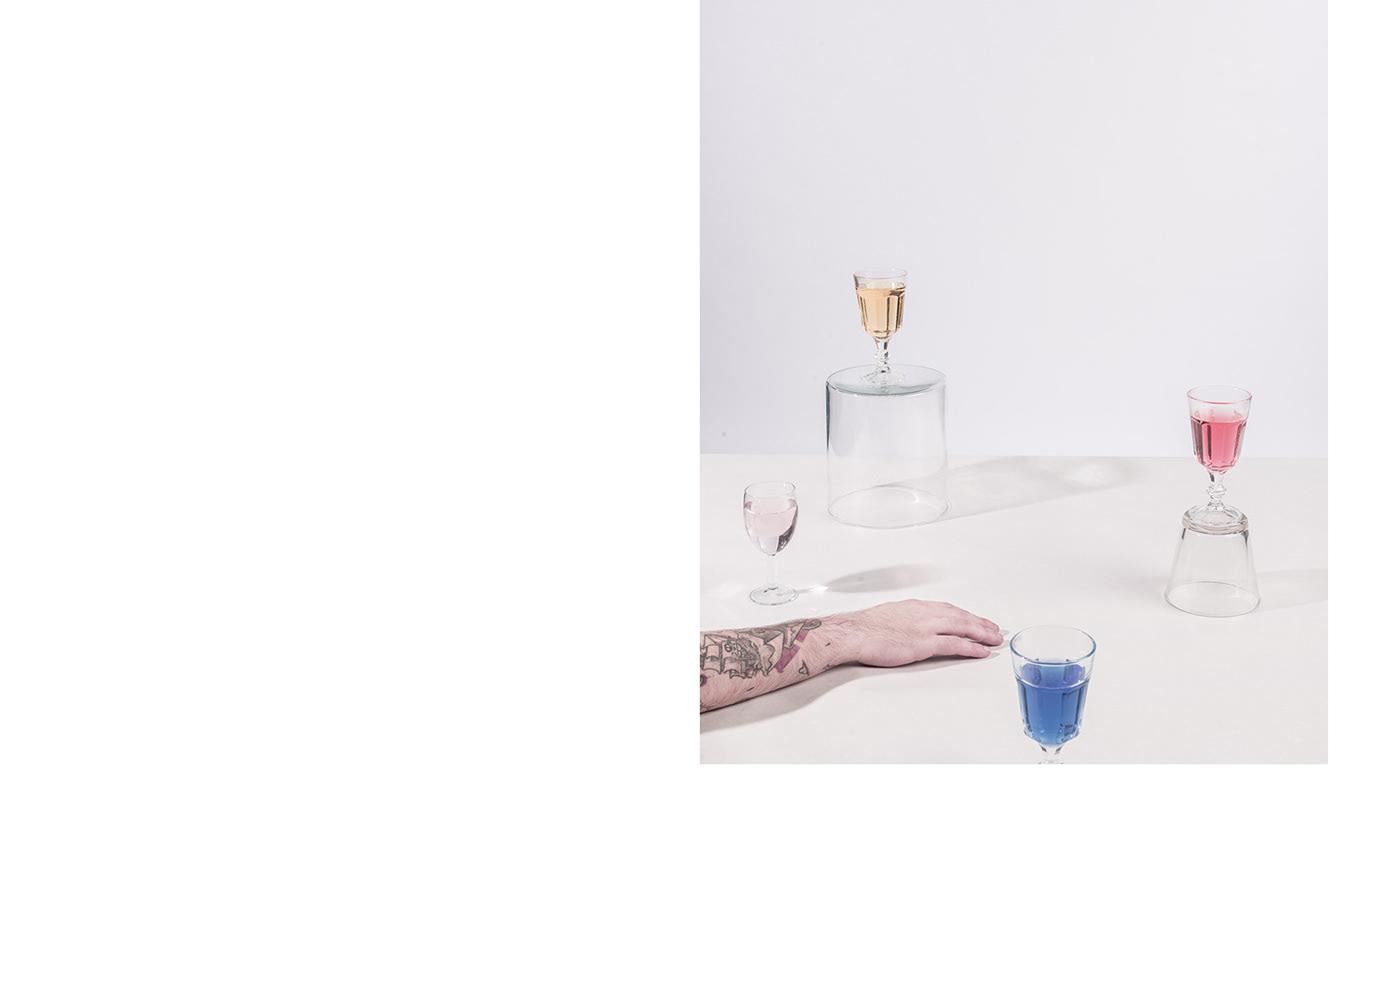 shooting shoot experimental glasses compo White design concept Minimalism